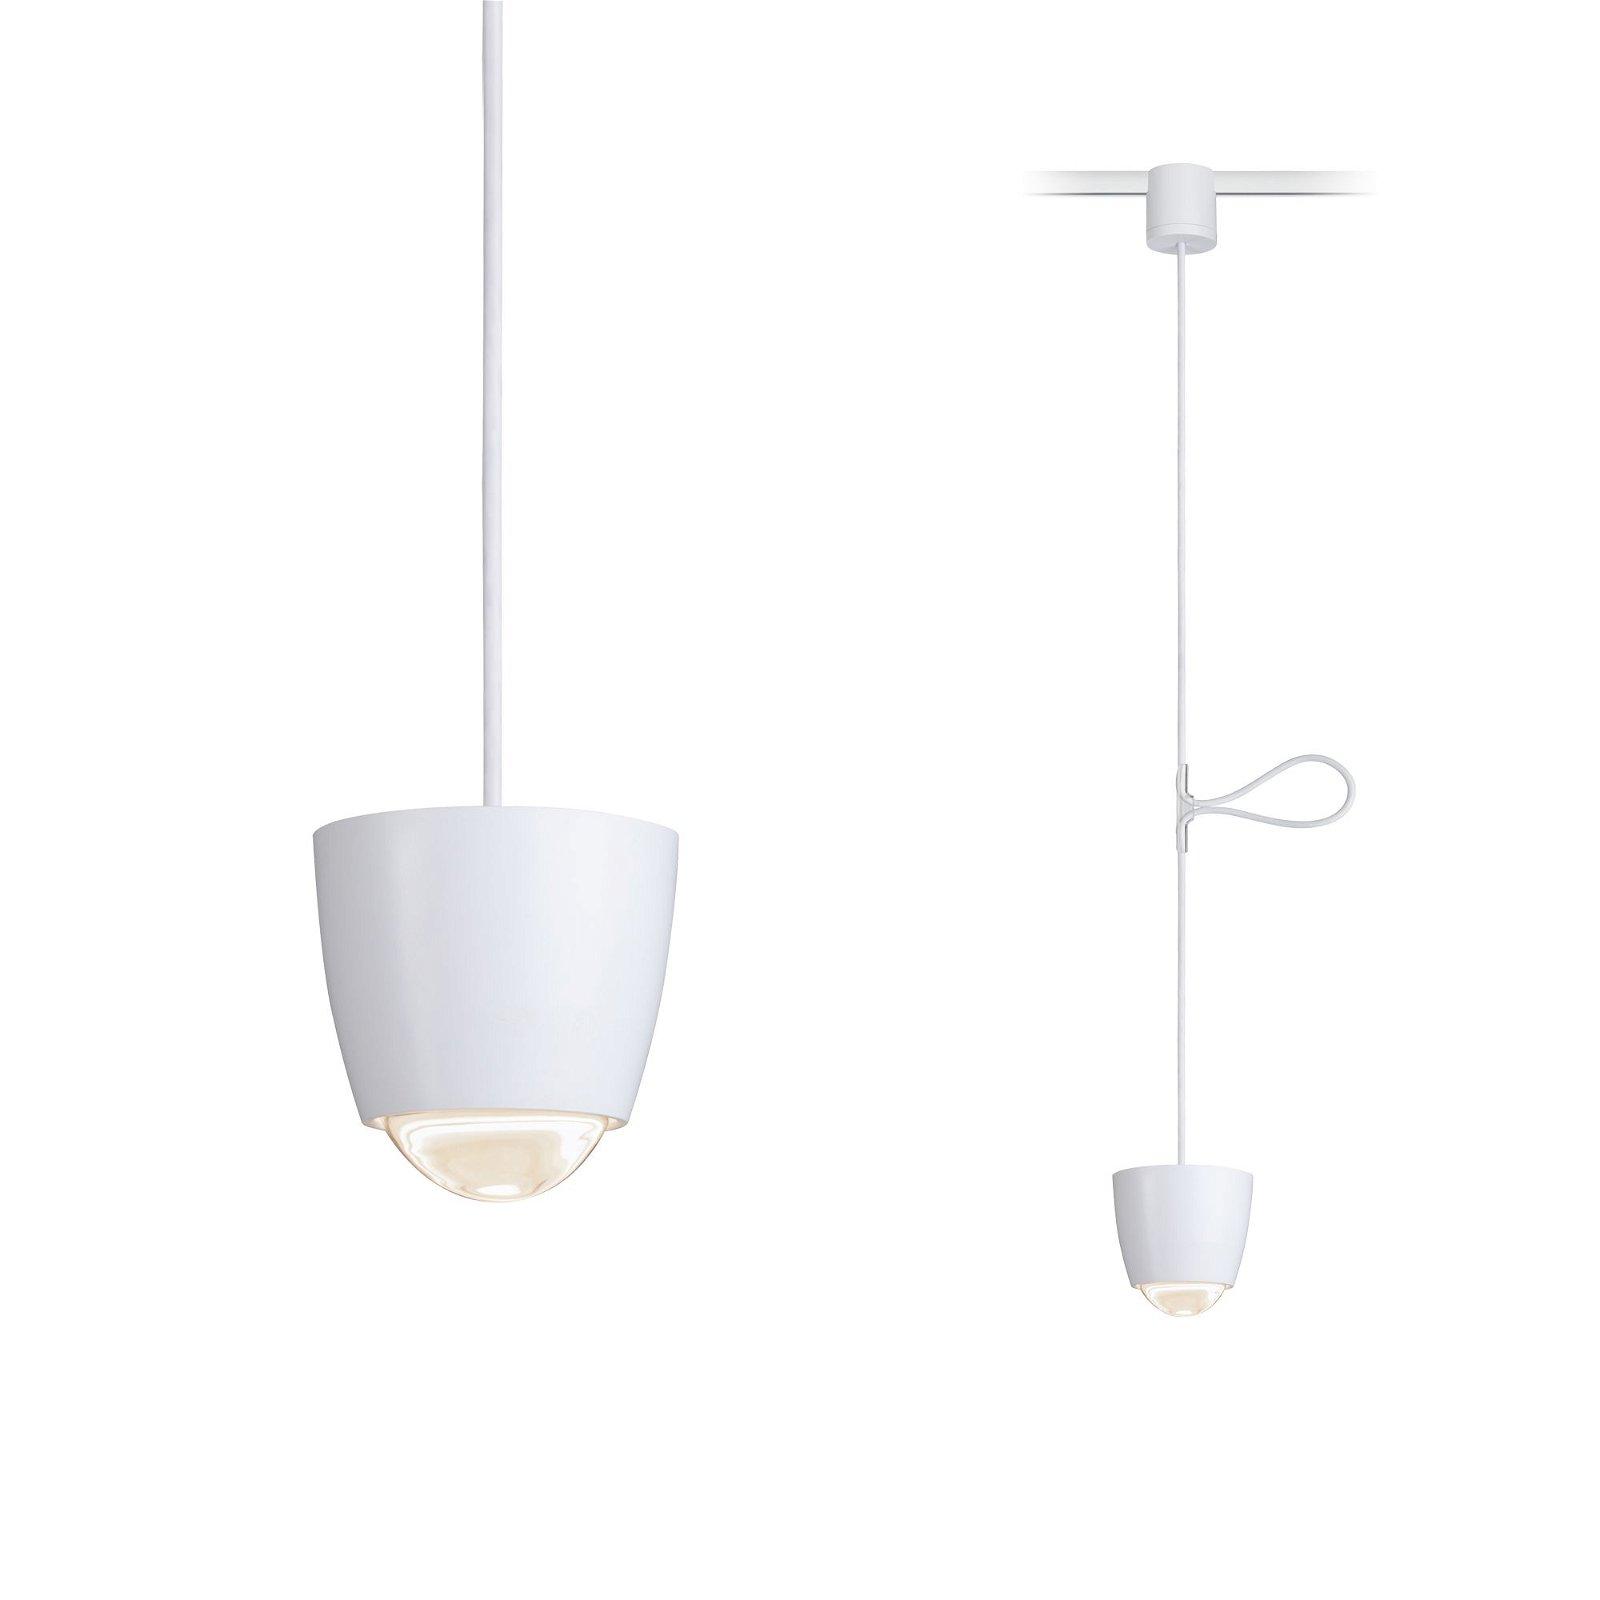 NanoRail Suspension LED Cono 6,5W Blanc dépoli